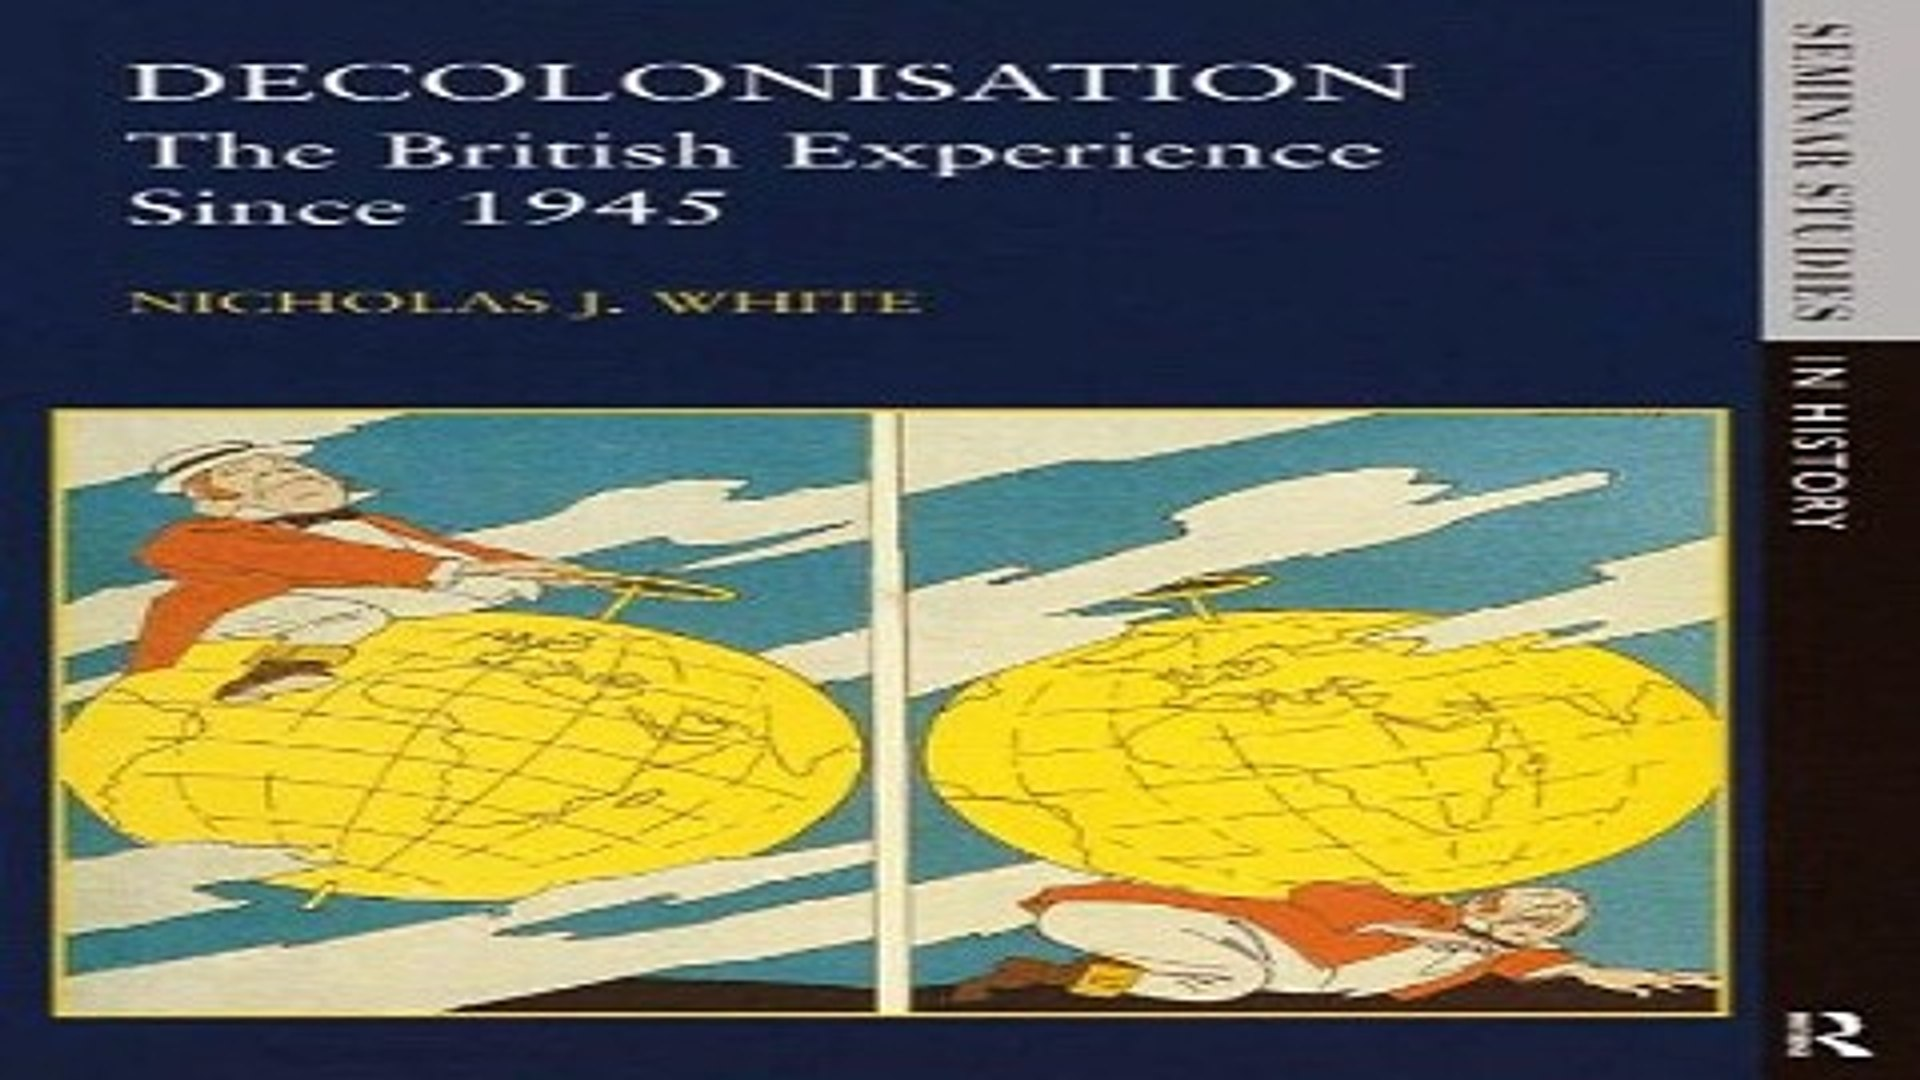 Decolonisation: The British Experience since 1945 (Seminar Studies)